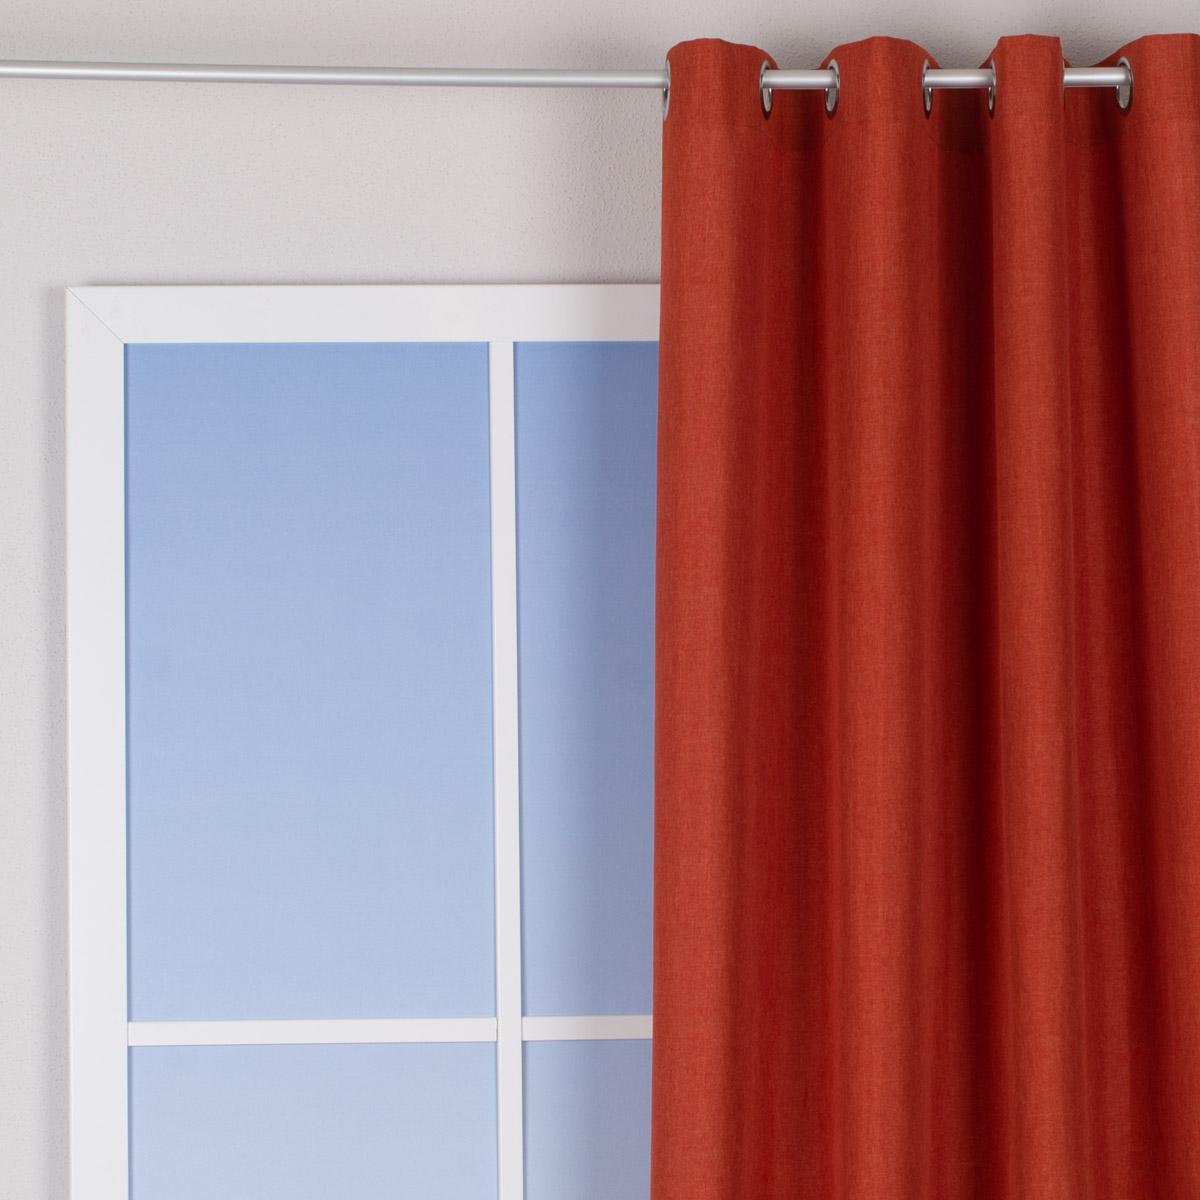 Vorhang Fertigvorhang Ösenschal einfarbig grau 140x245cm